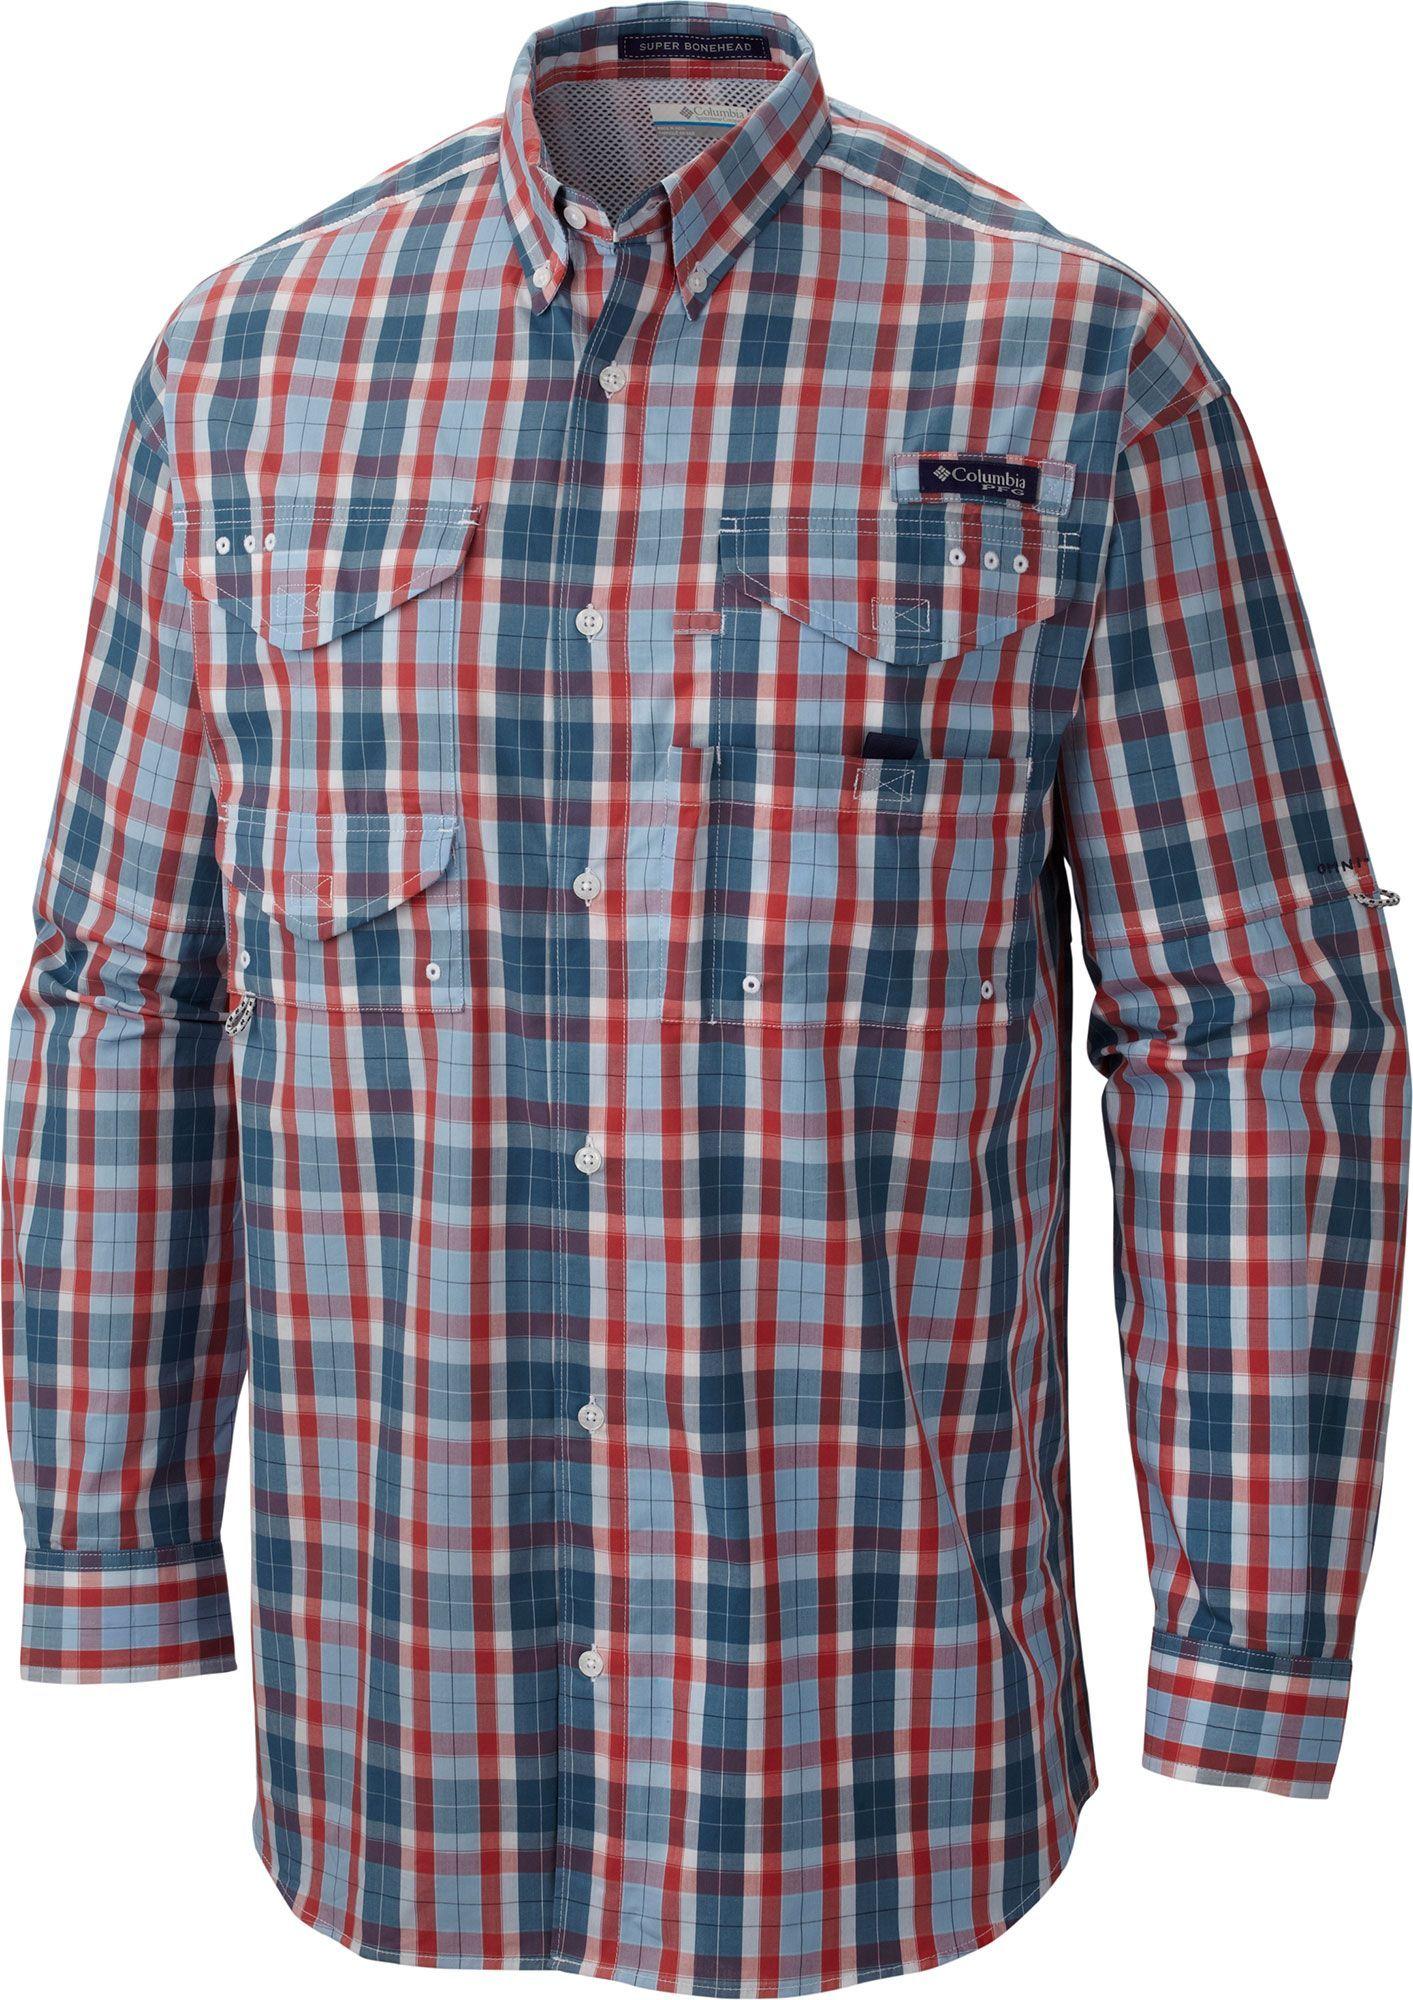 3f5582f2982 Columbia Men's Super Bonehead Classic Long Sleeve Fishing Shirt, Size: 3XL,  Red